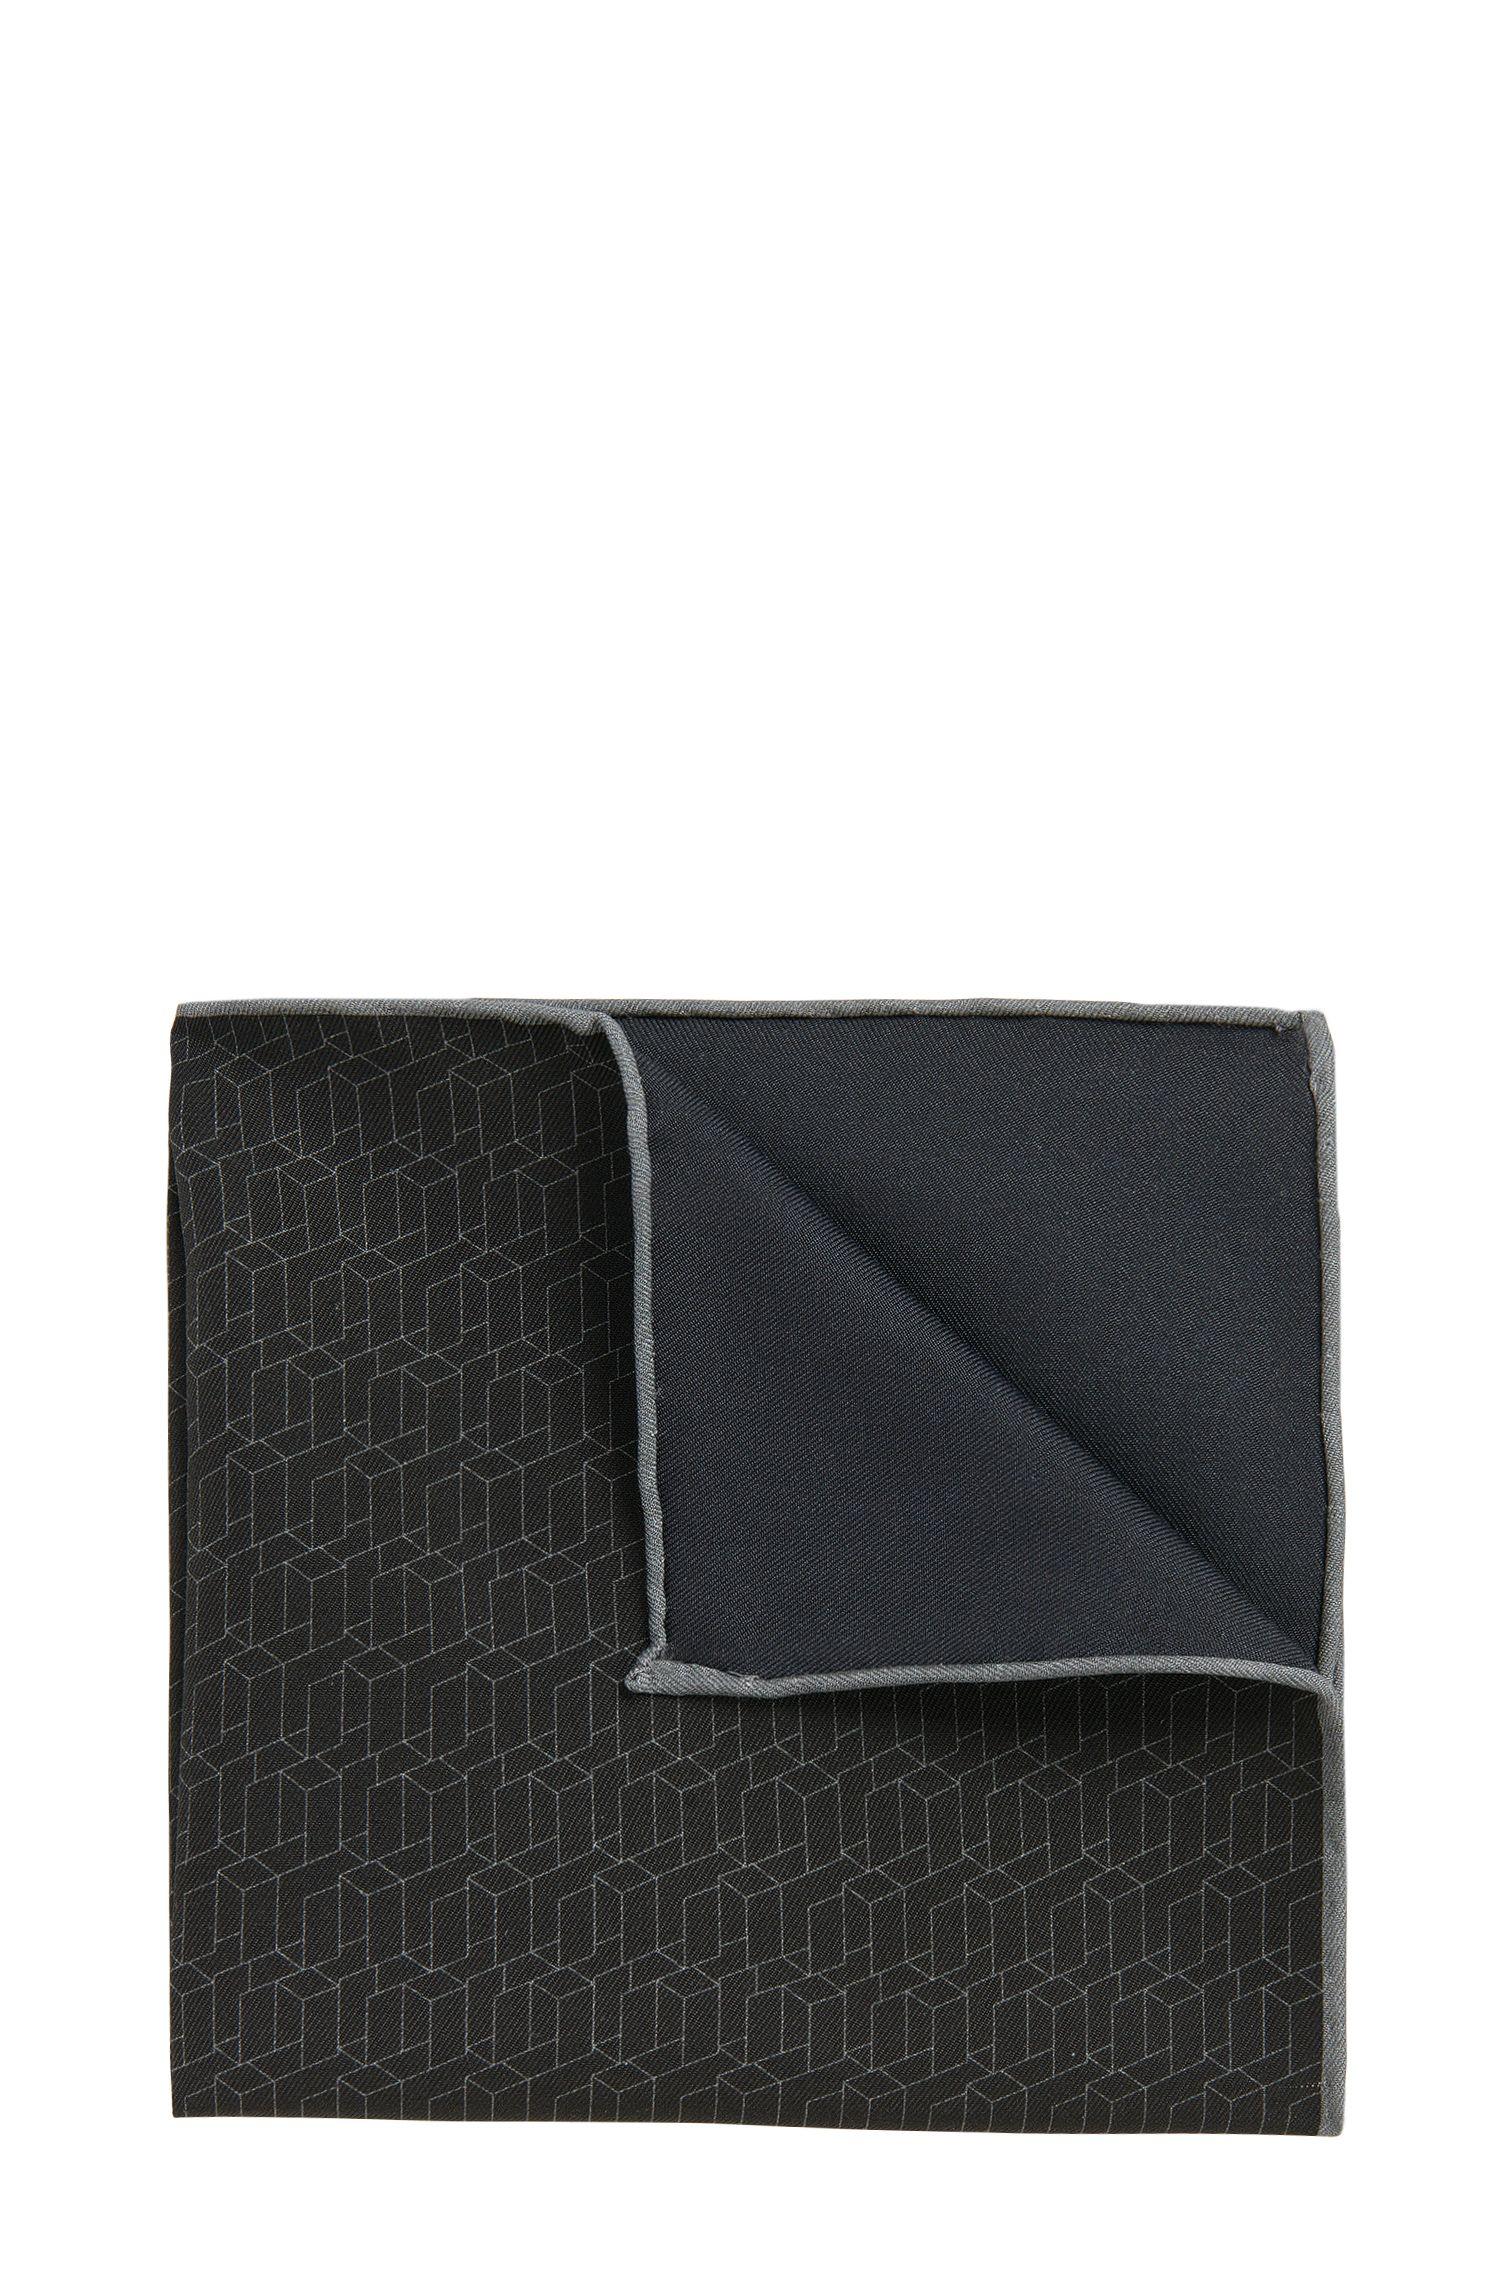 'T-Pocket sq. cm 33x33' | Italian Silk Cotton Pocket Square